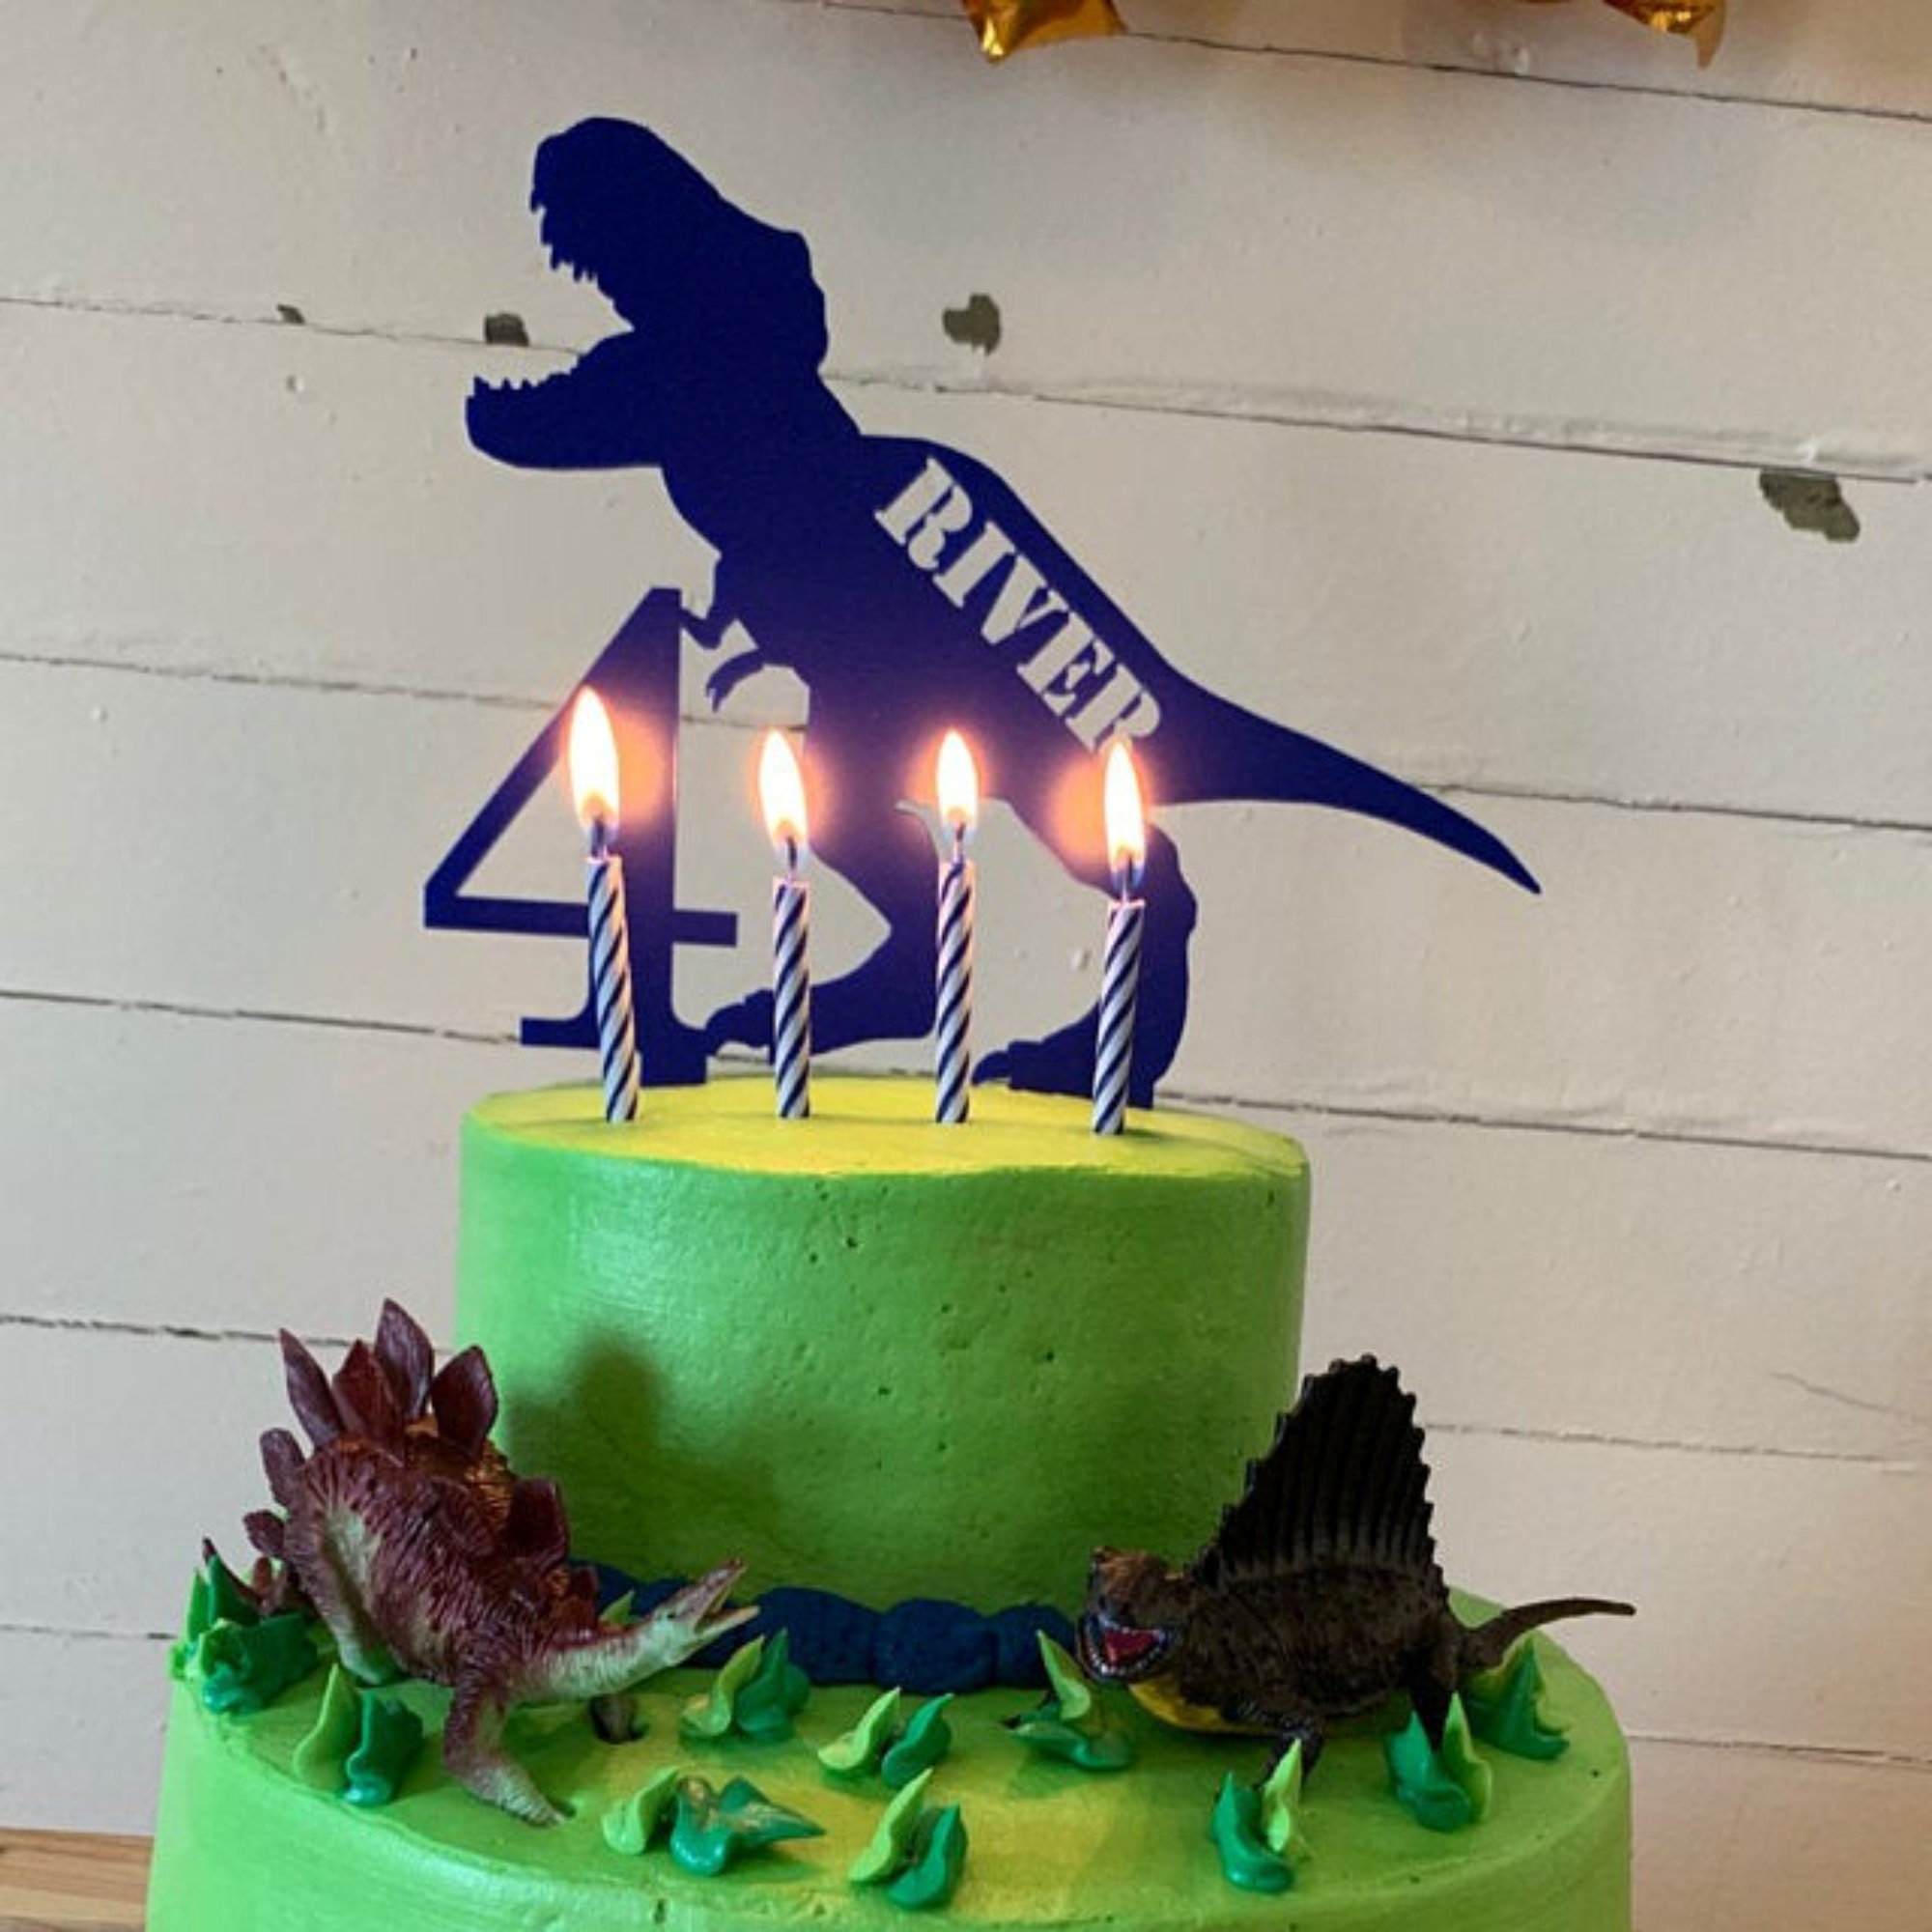 T-Rex Custom Name Cake Topper Kid/'s Birthday Cake Topper Dinosaur Topper Dinosaur Cake Topper Birthday Cake Topper T-Rex Topper